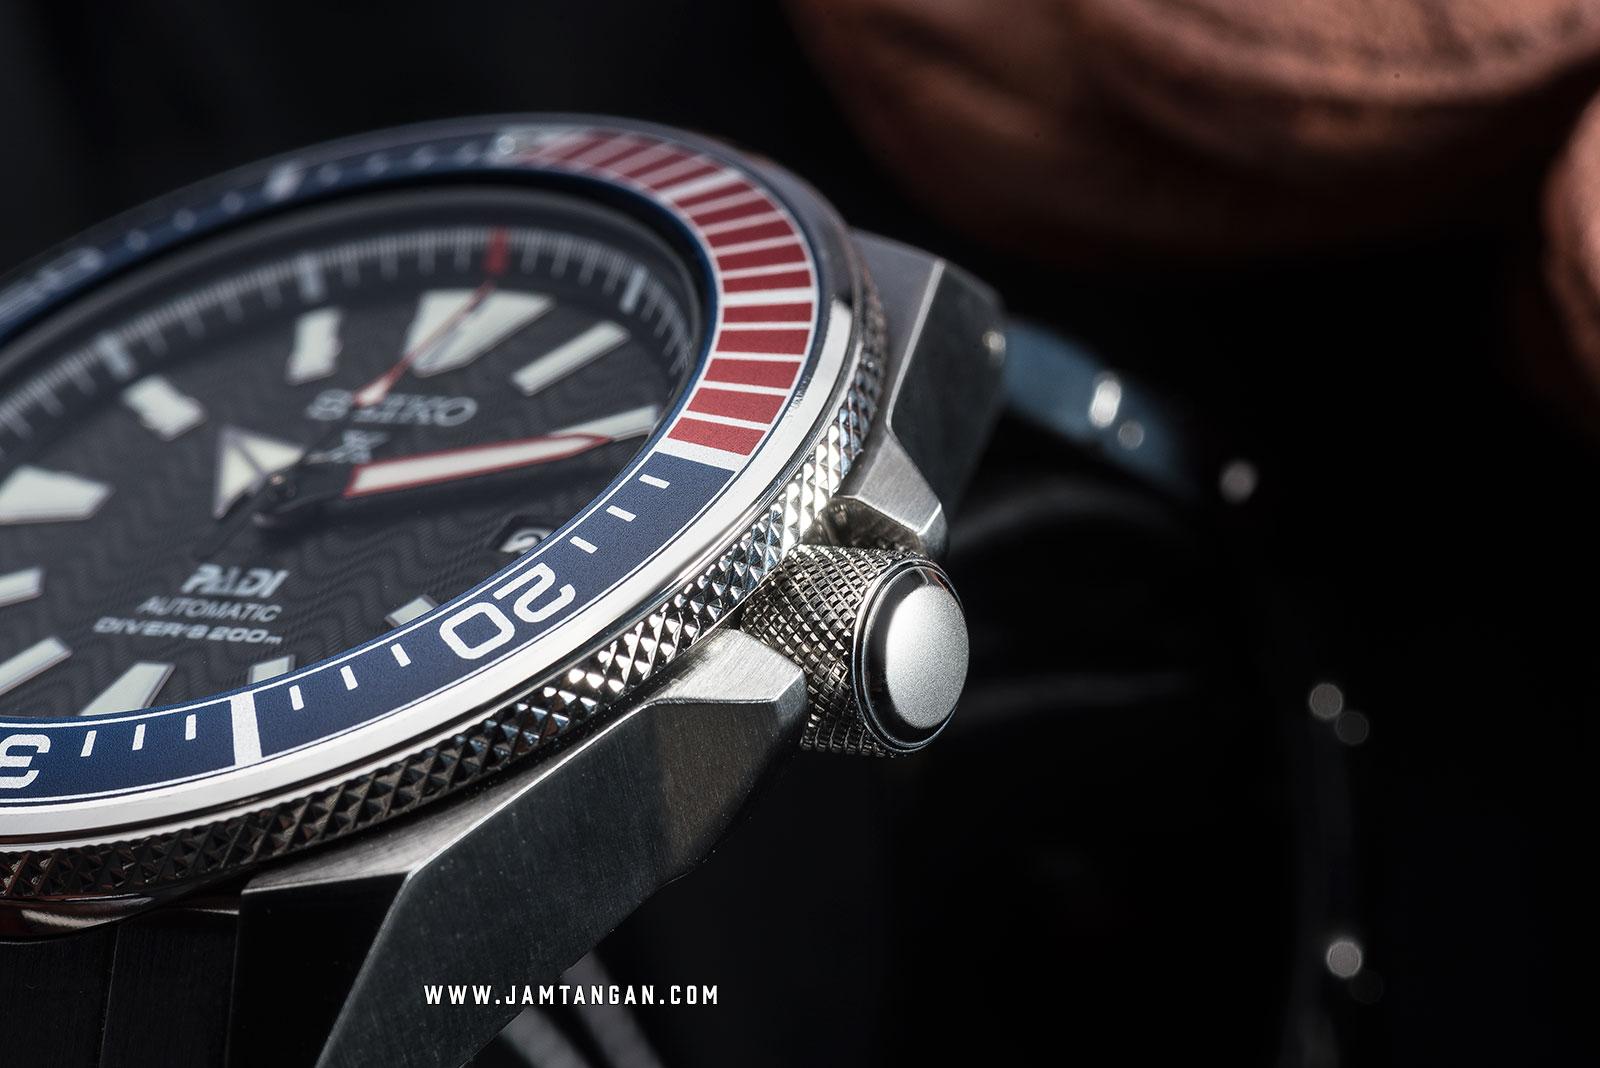 Seiko Prospex SRPB99K1 Samurai PADI Black Pattern Dial Stainless Steel Strap Special Edition Machtwatch